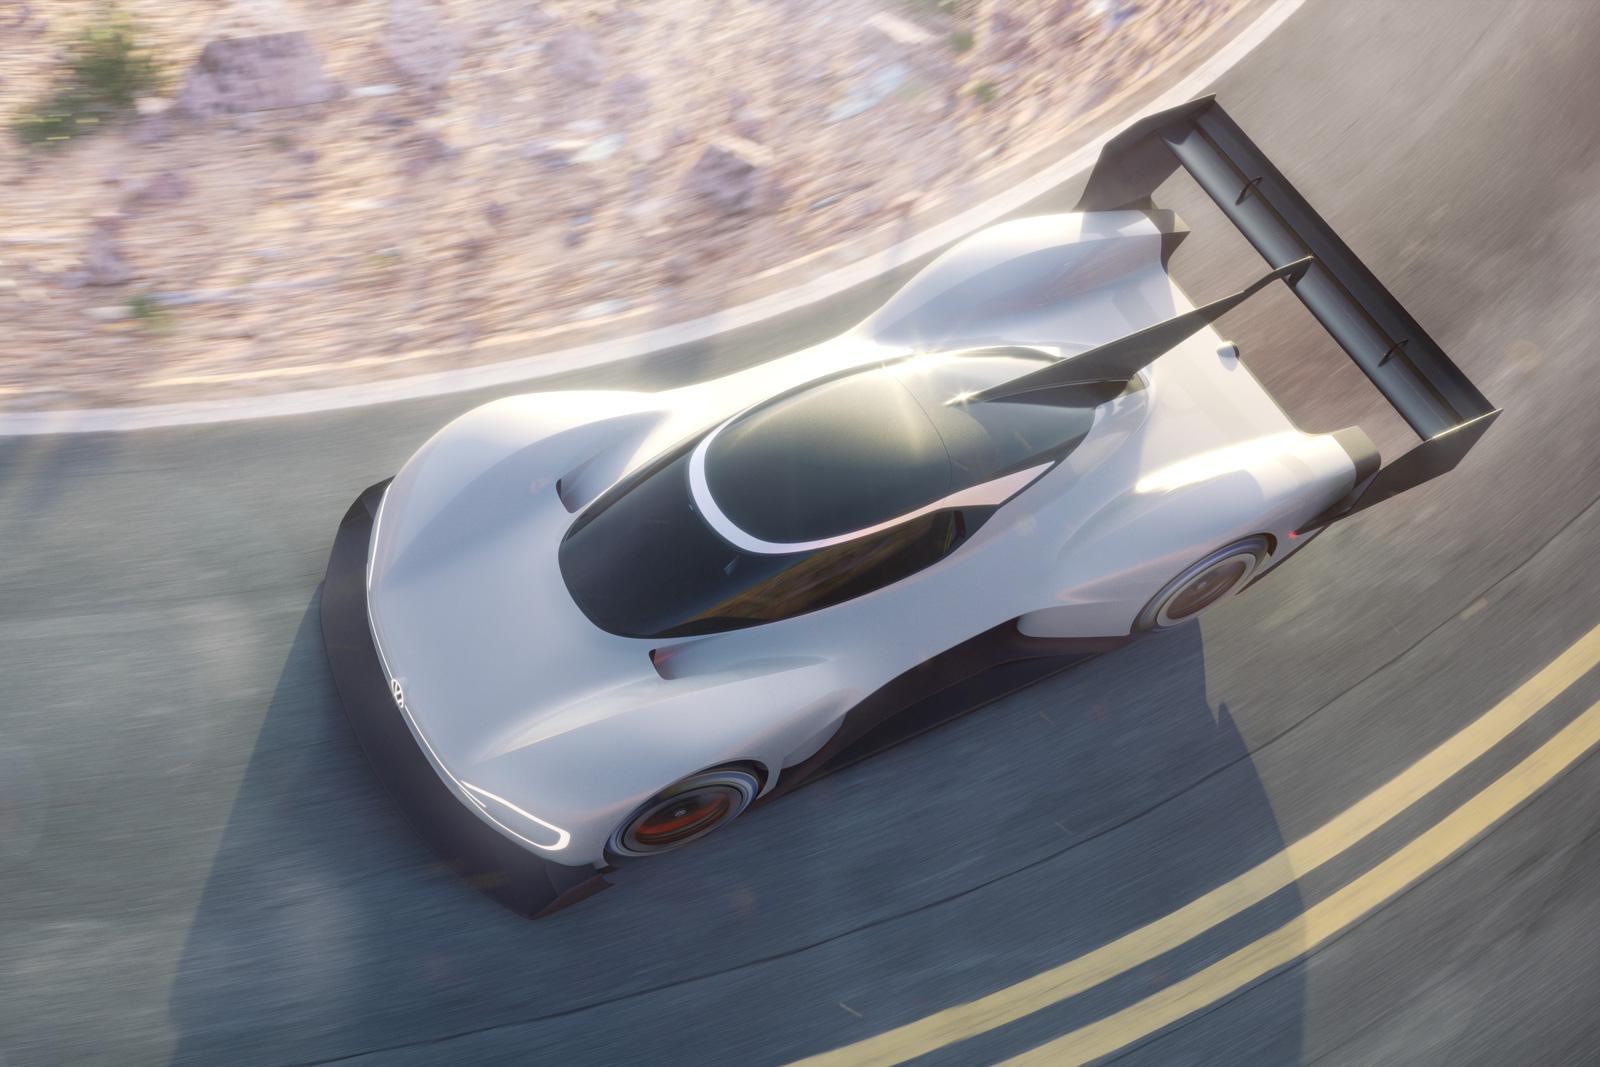 VW unveils electric race car built to tackle Pikes Peak